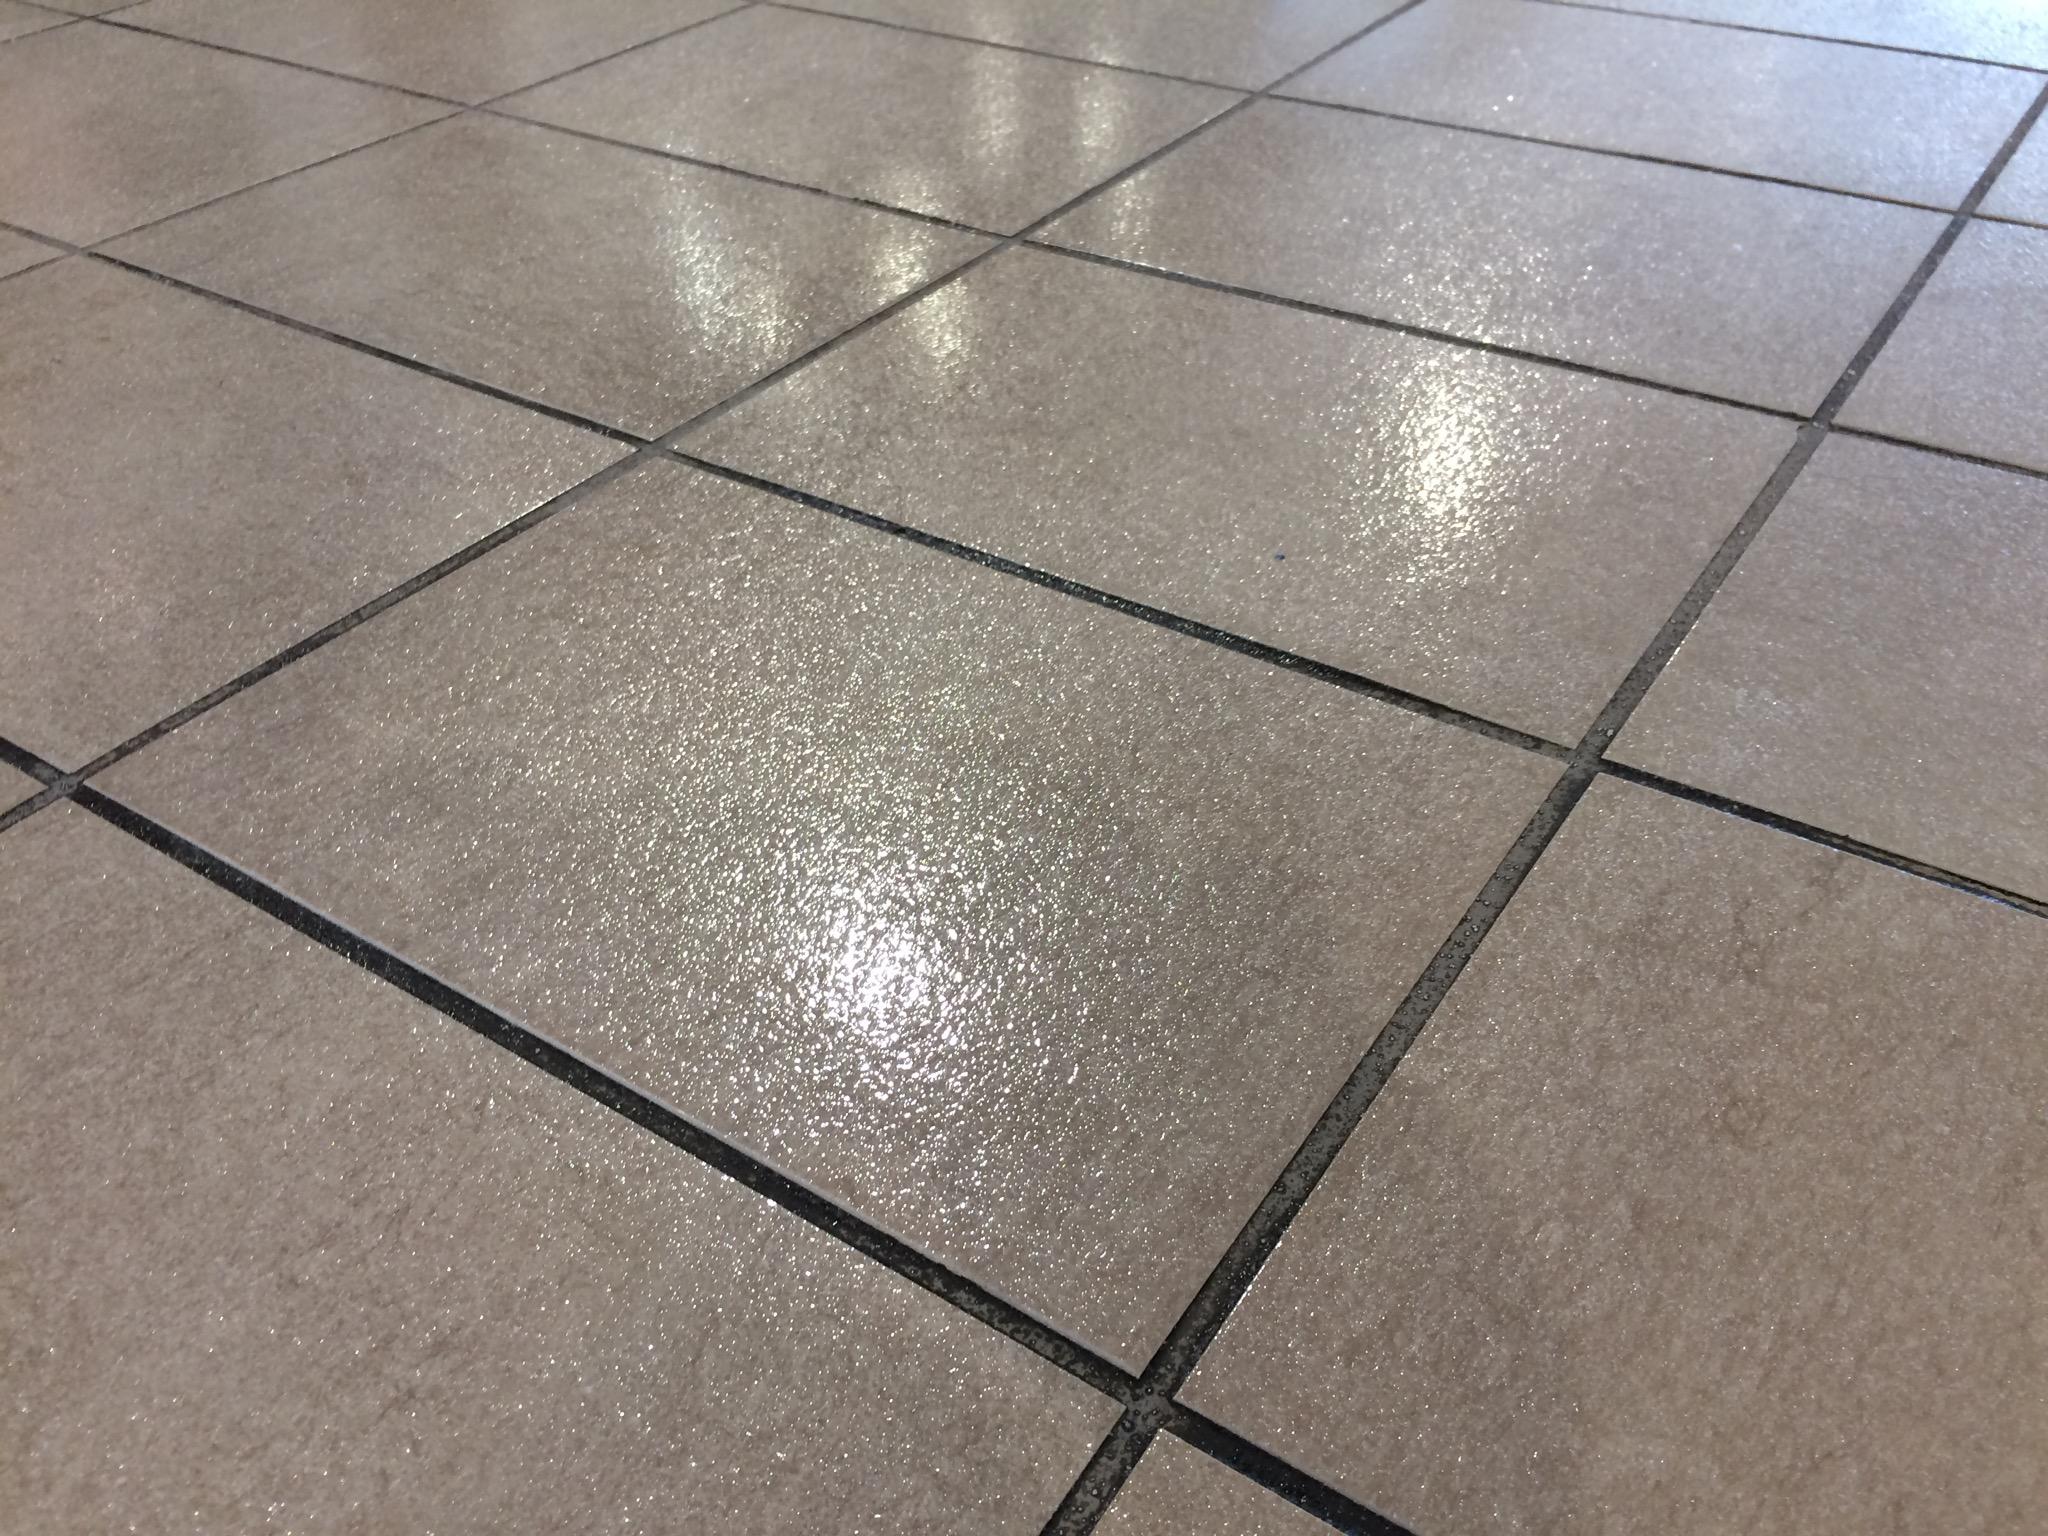 SparkleTuff Anti-Slip Floor Coating